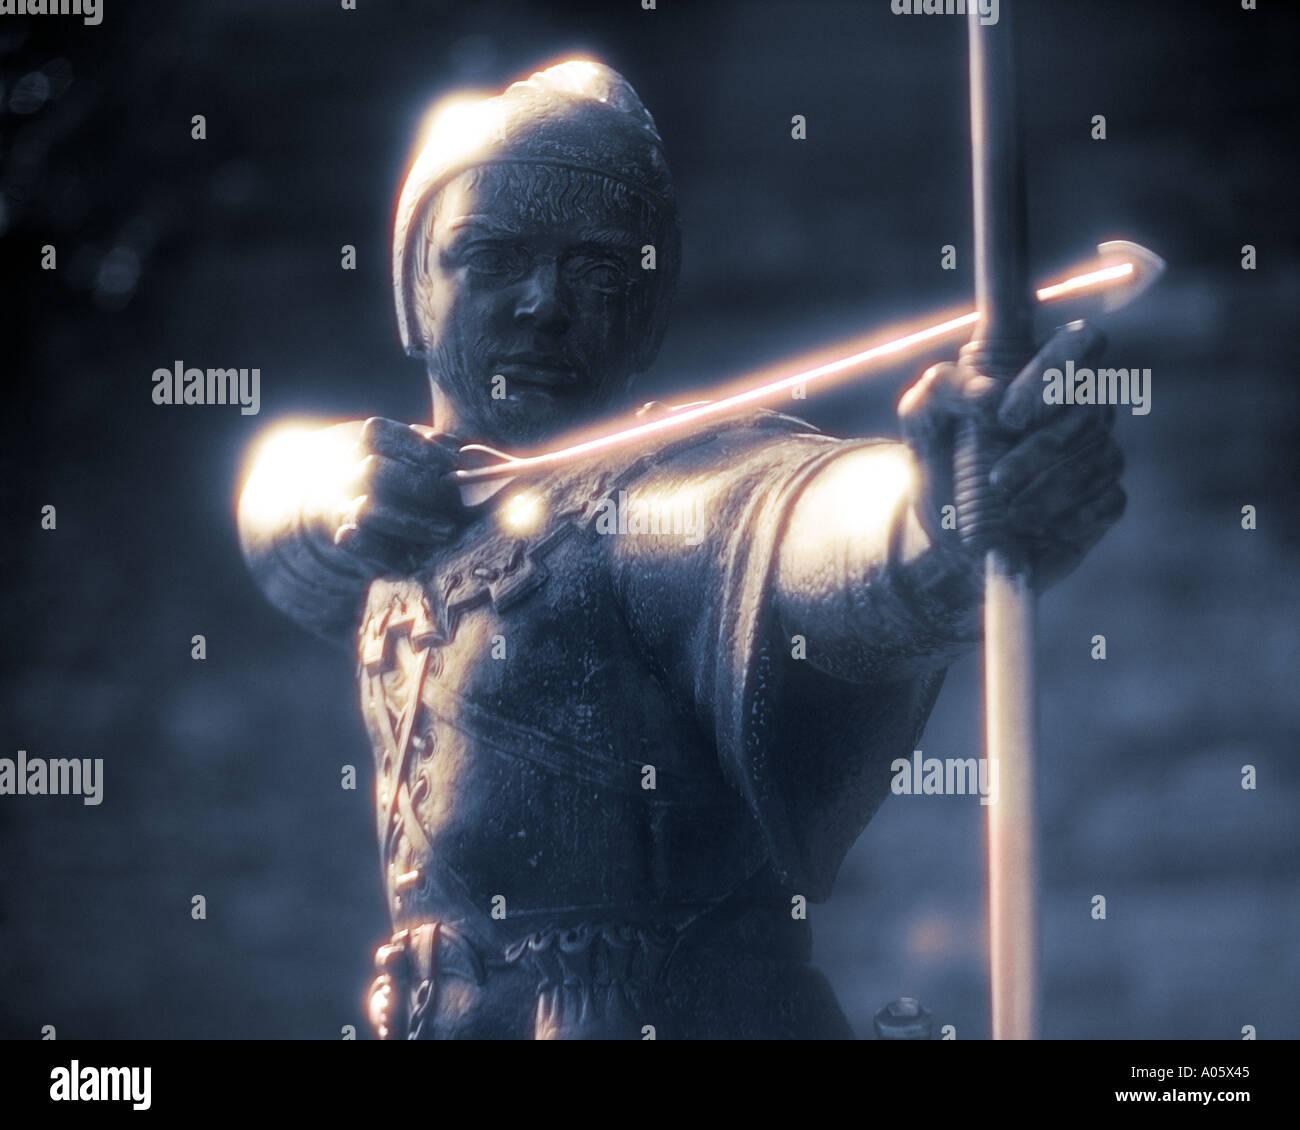 GB - NOTTINGHAM: Robin Hood Statue - Stock Image